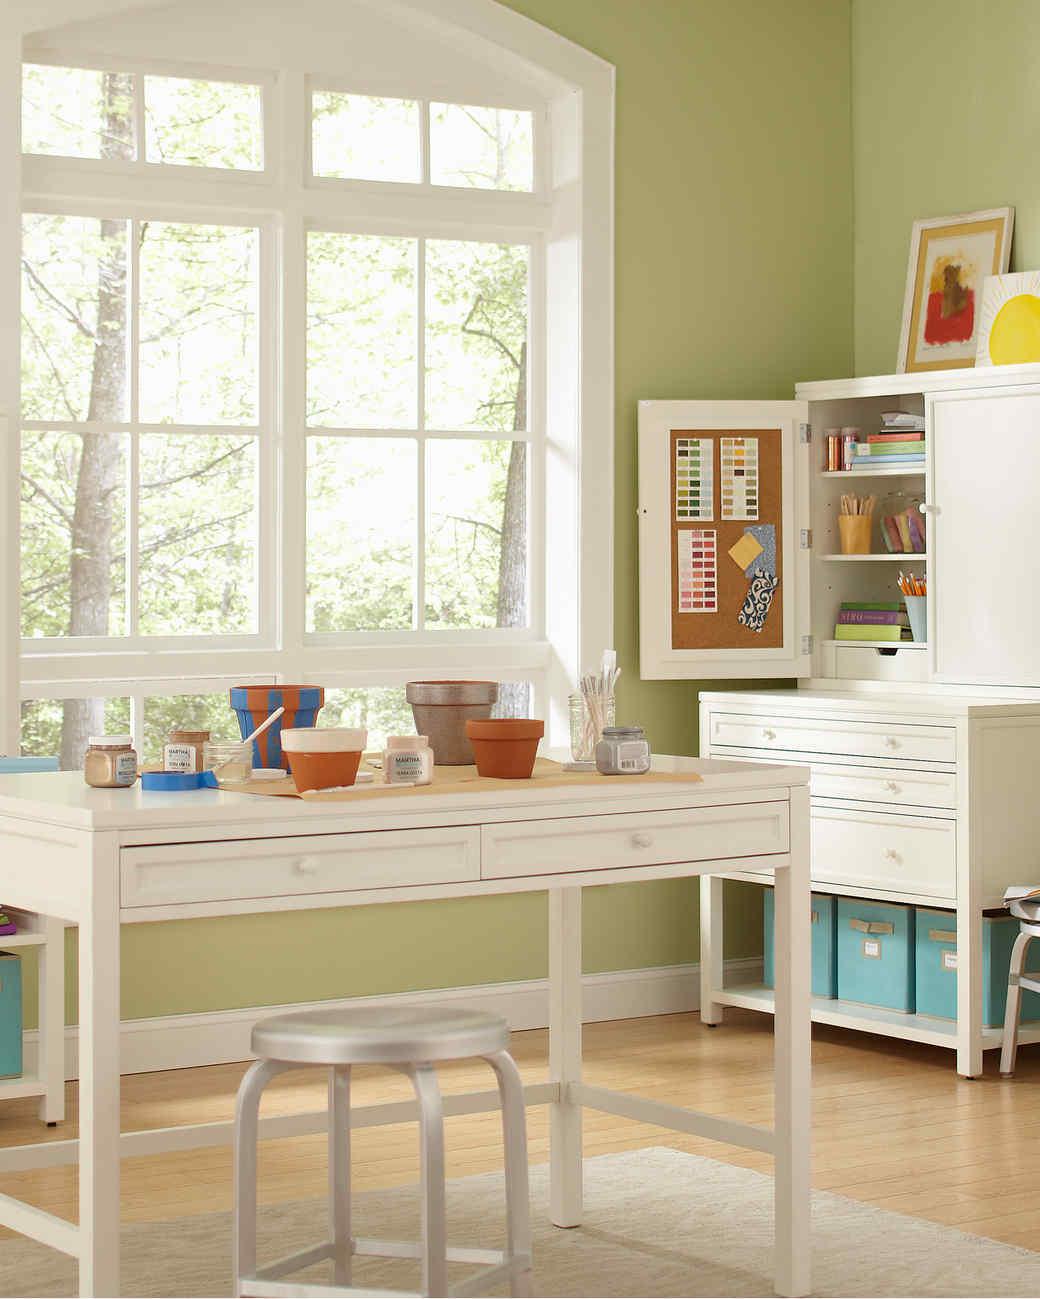 craft-furniture-homedepot-mrkt-0712.jpg